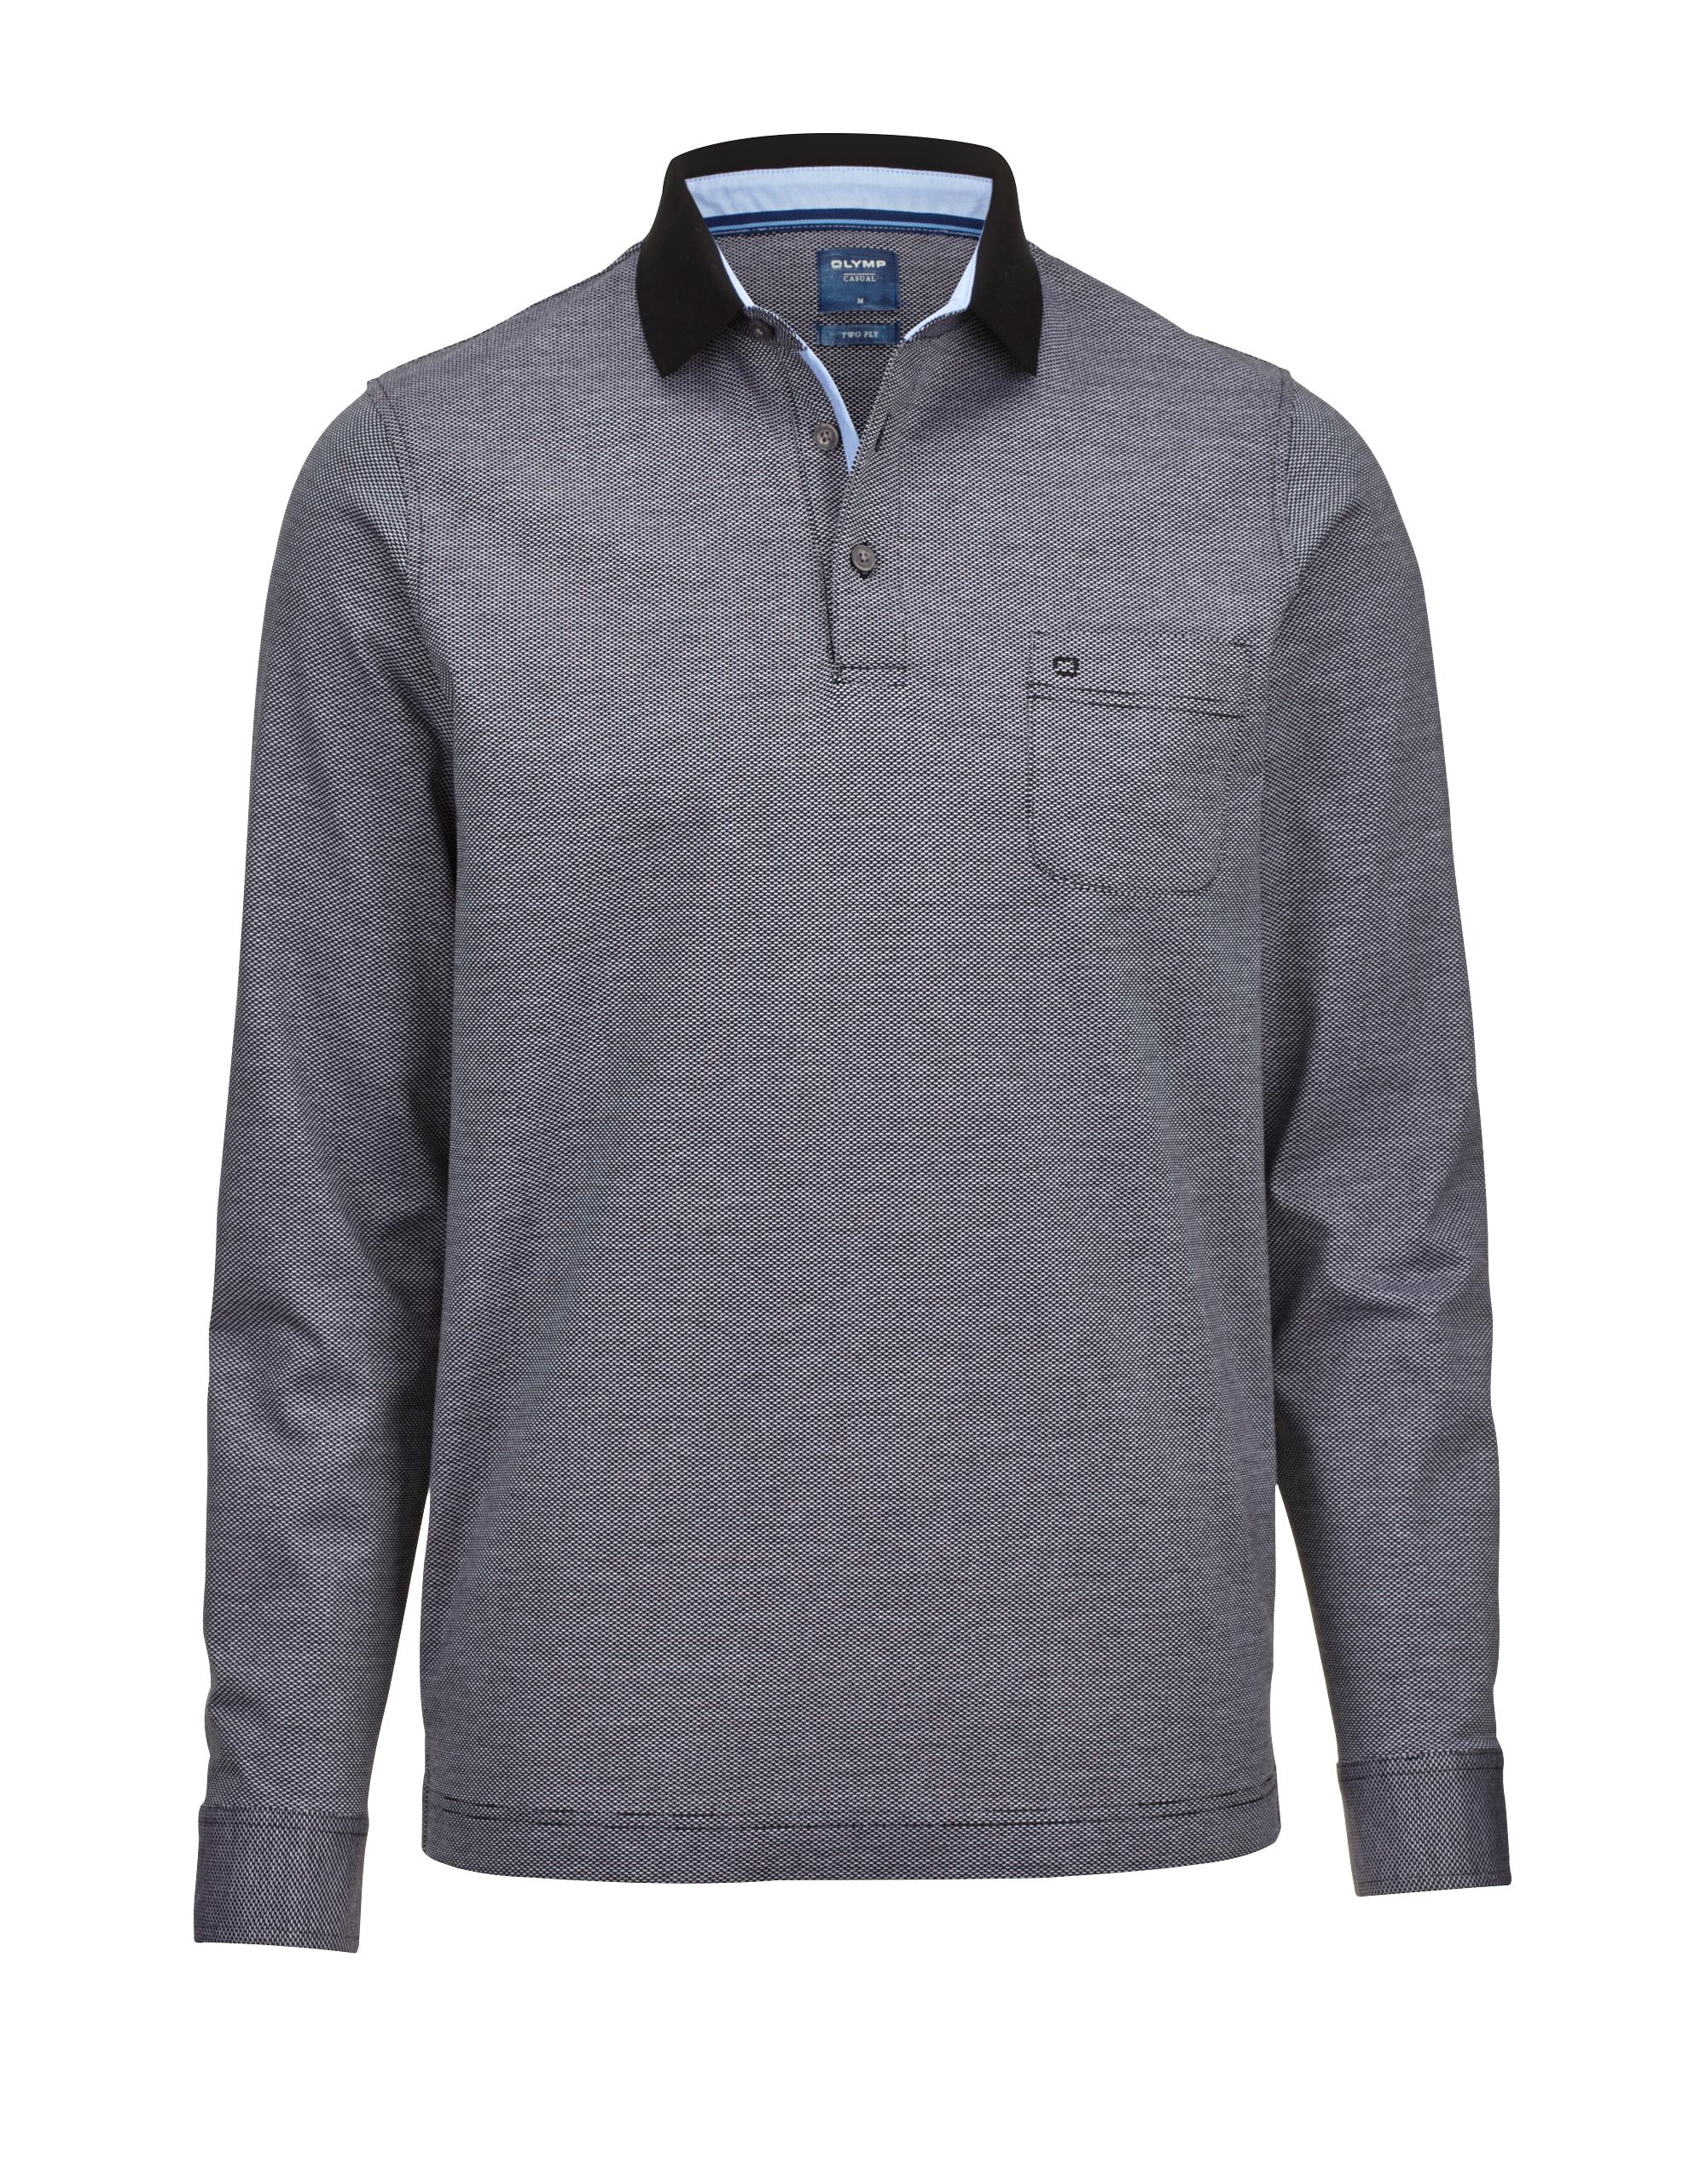 d709bb3c34731e Bekleidung » Herren-Polo Shirts online kaufen